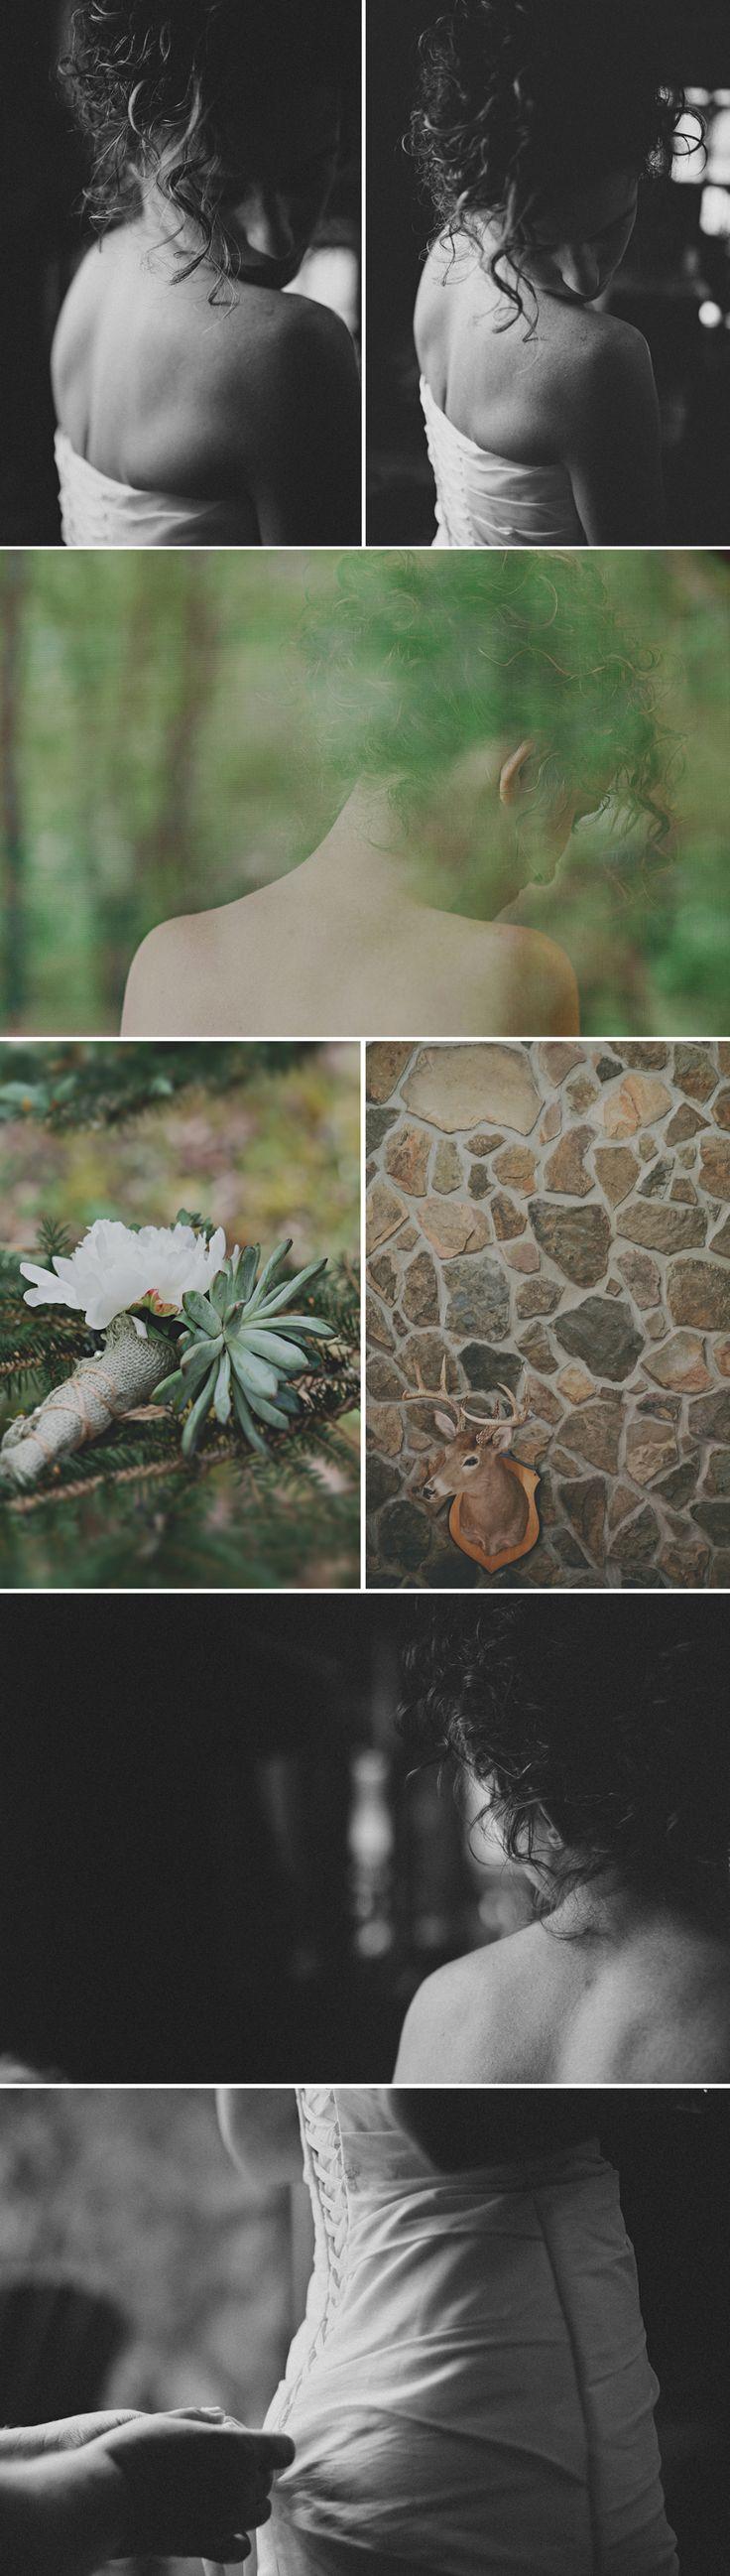 6655552aad85c98e0598c6232dc87912  taylors charlotte - White Wedding